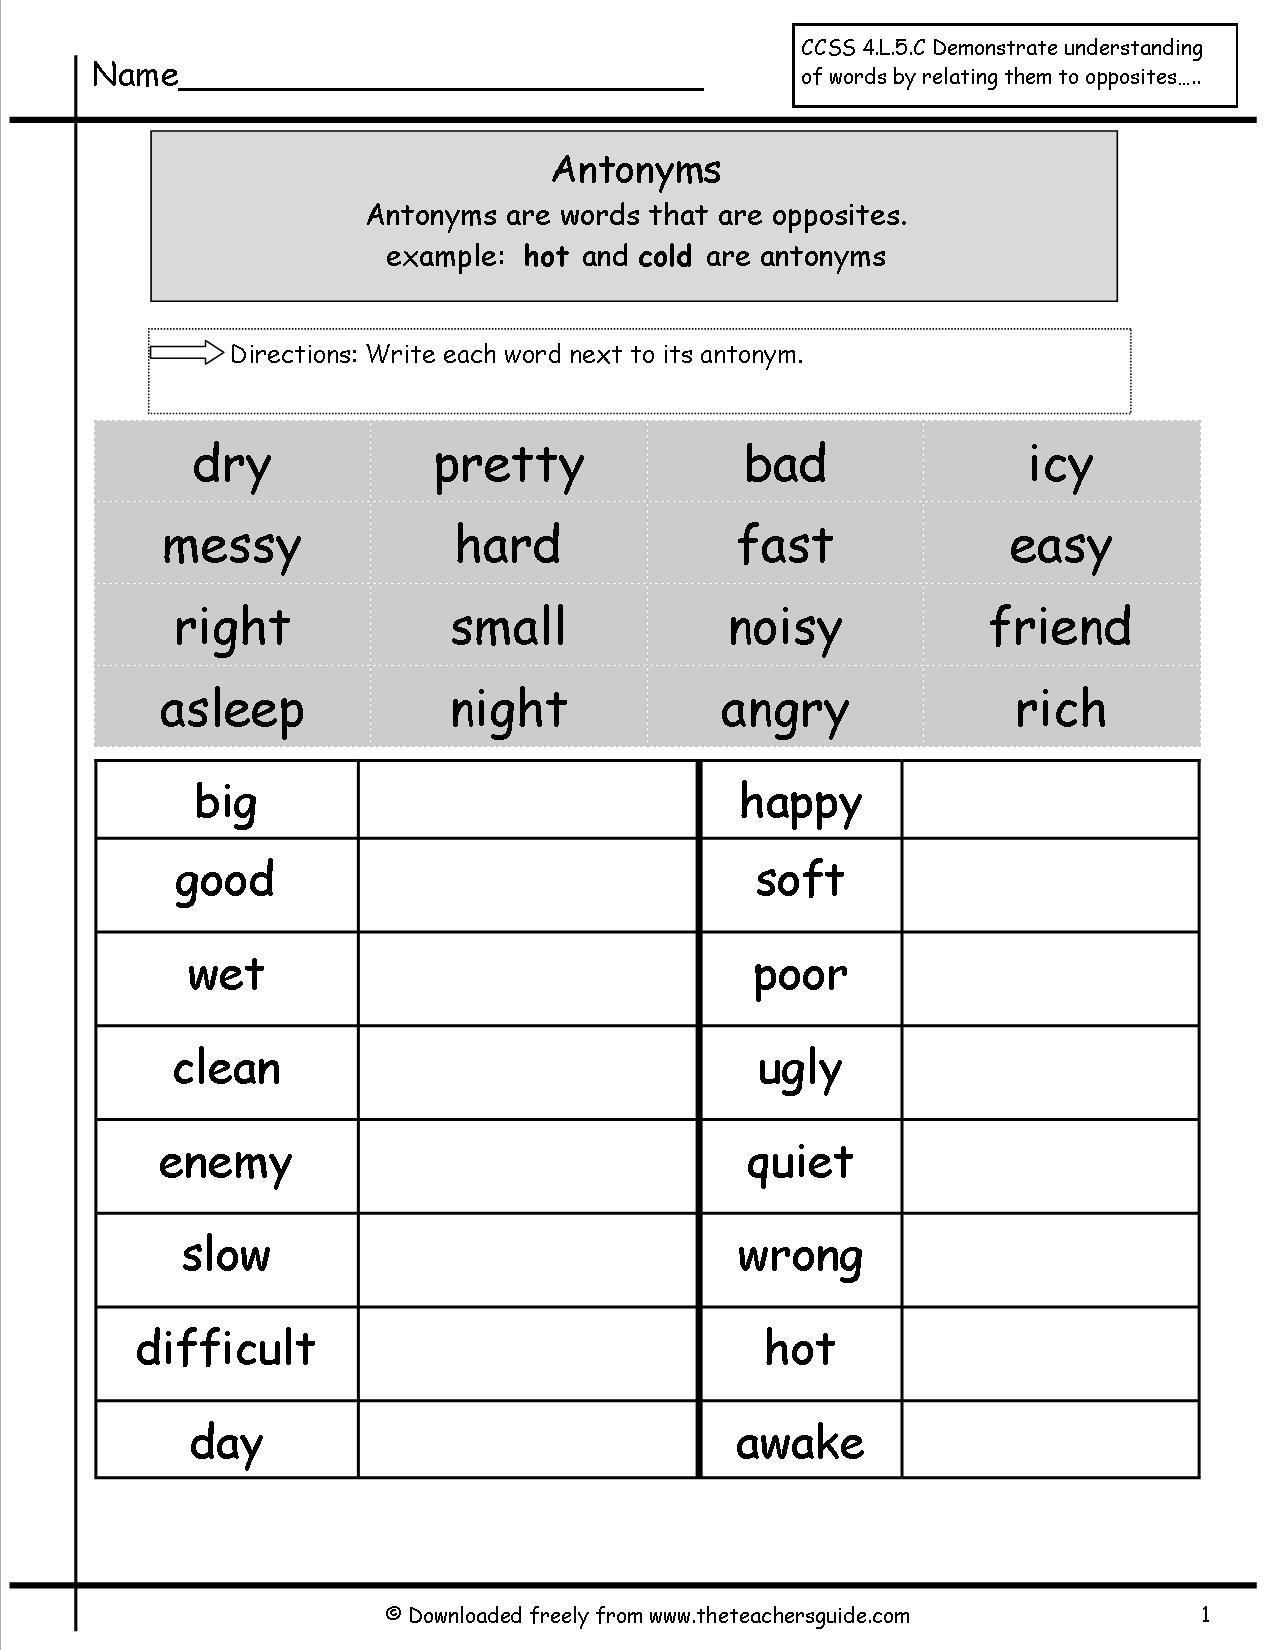 18 Best Images Of Grammar Pronouns Worksheet